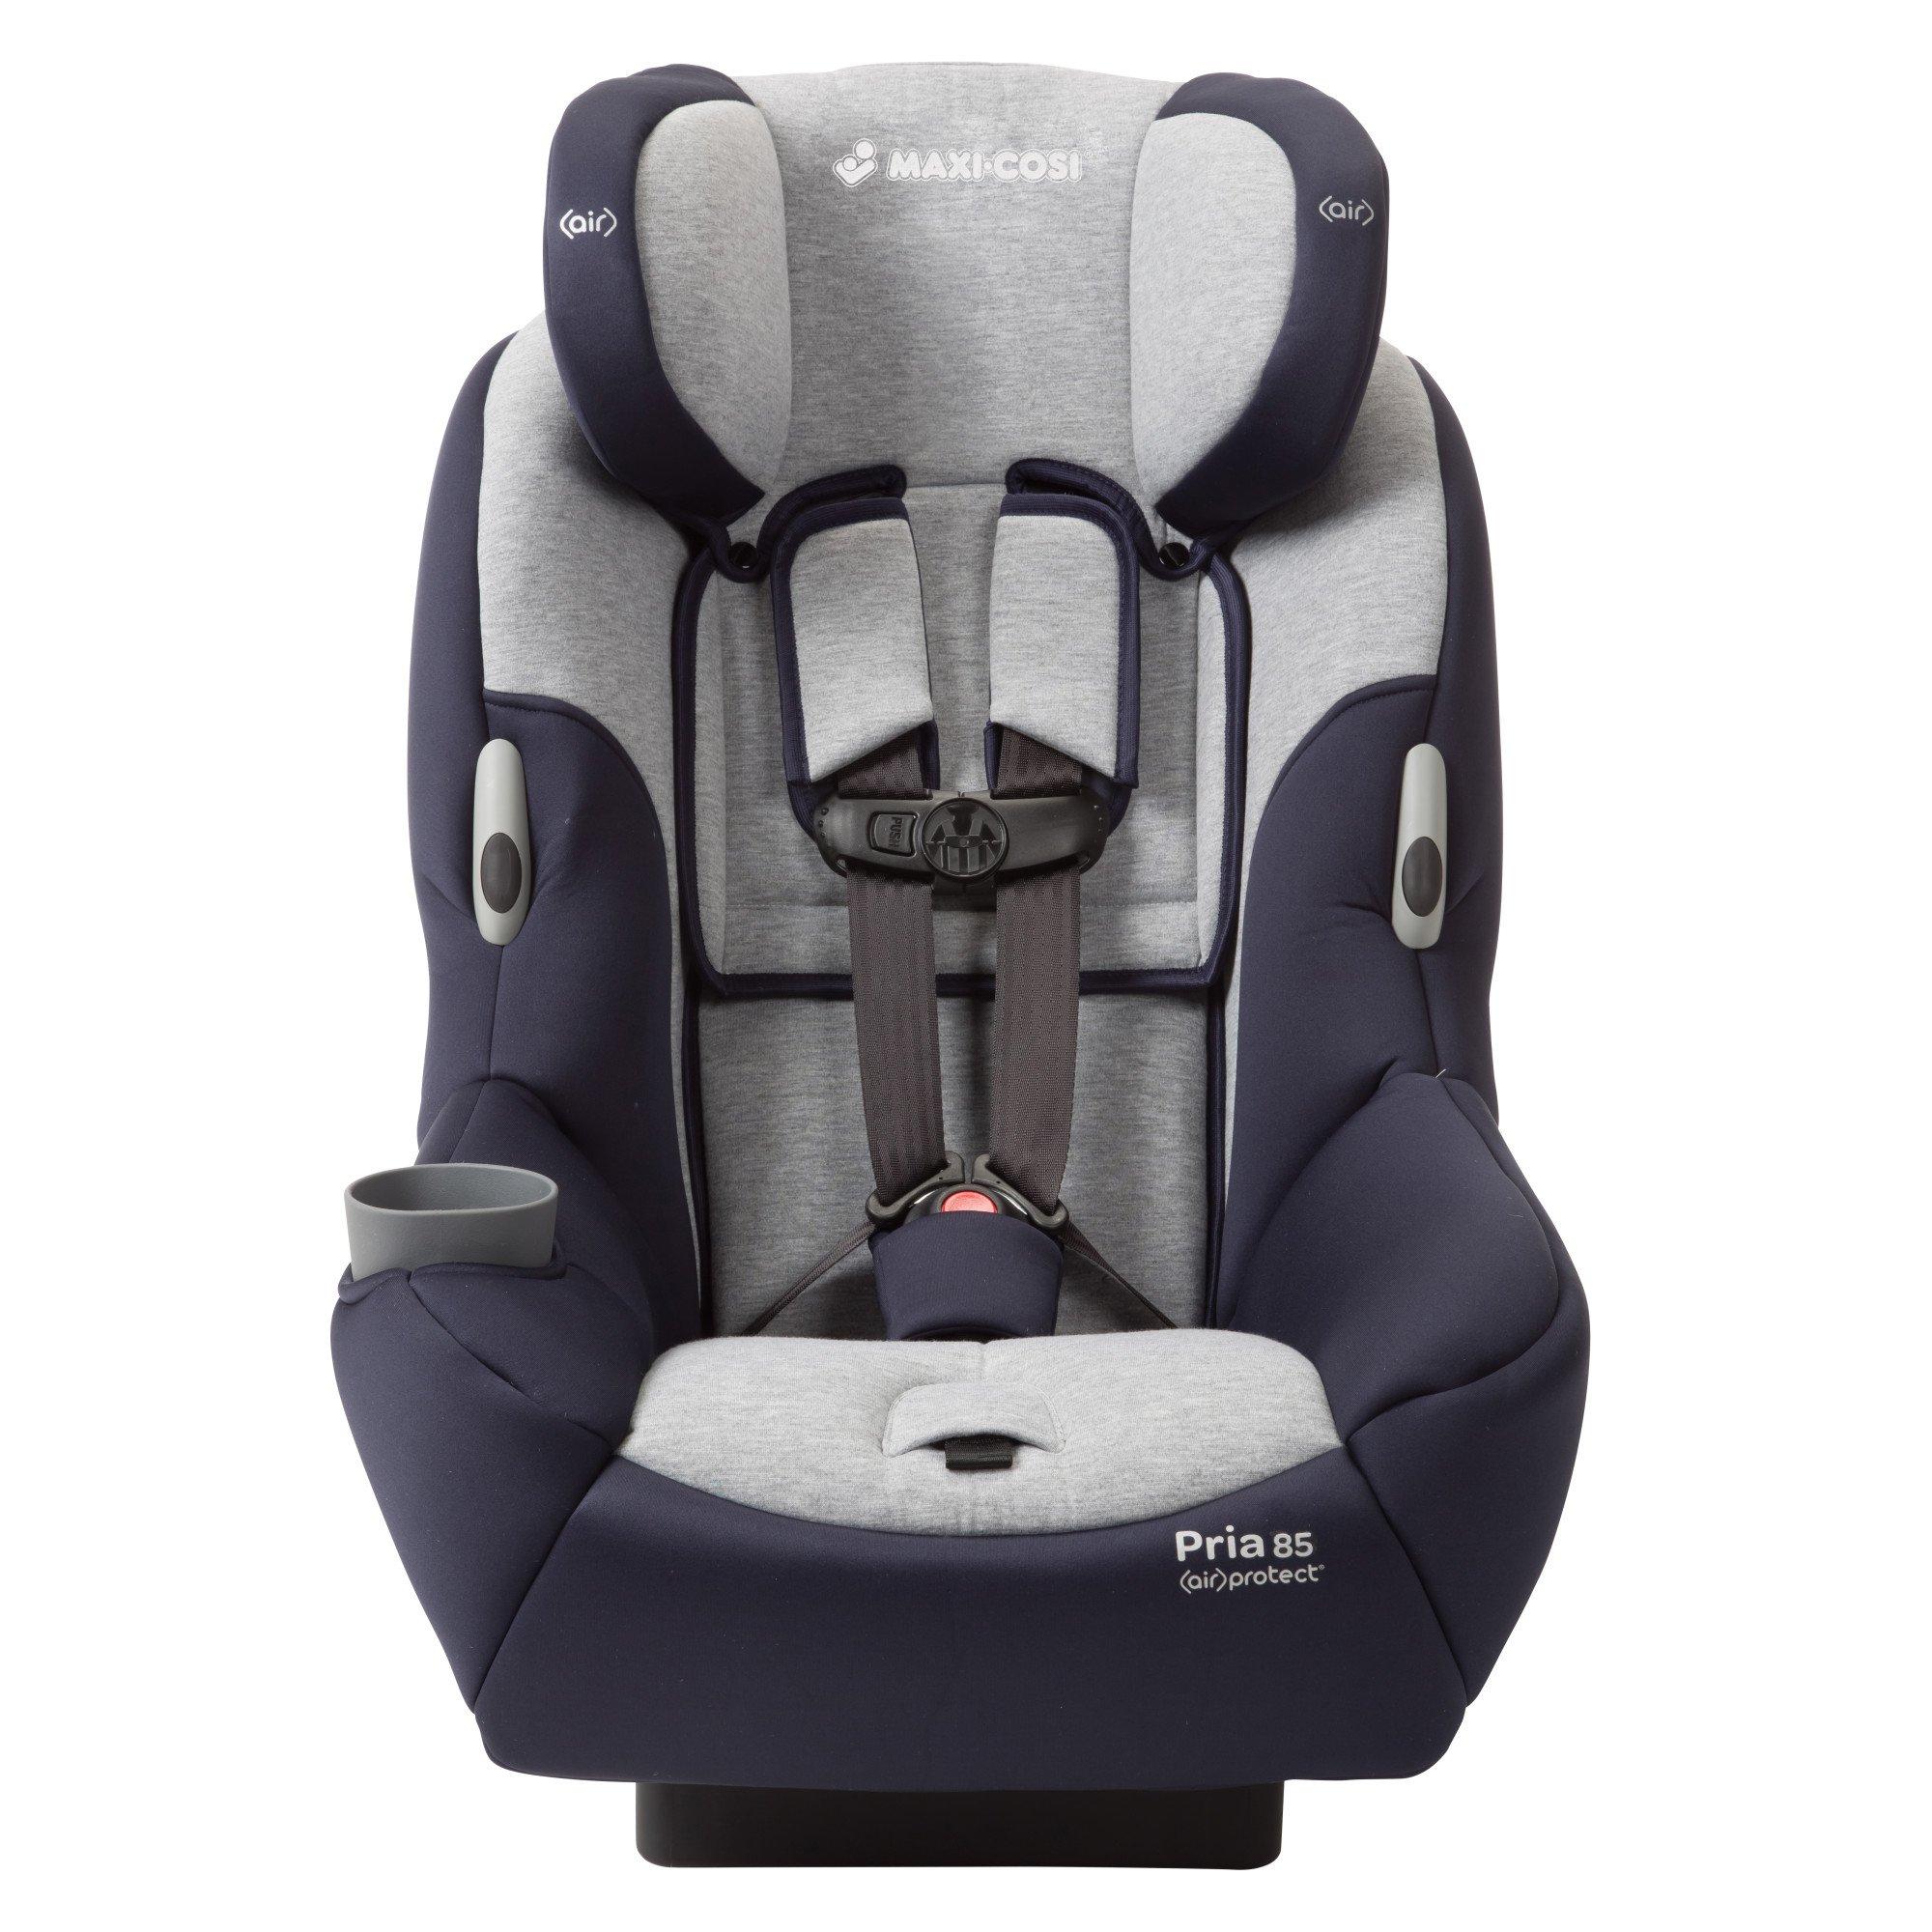 Maxi-Cosi Pria 85 Convertible Car Seat, Brilliant Navy by Maxi-Cosi (Image #4)